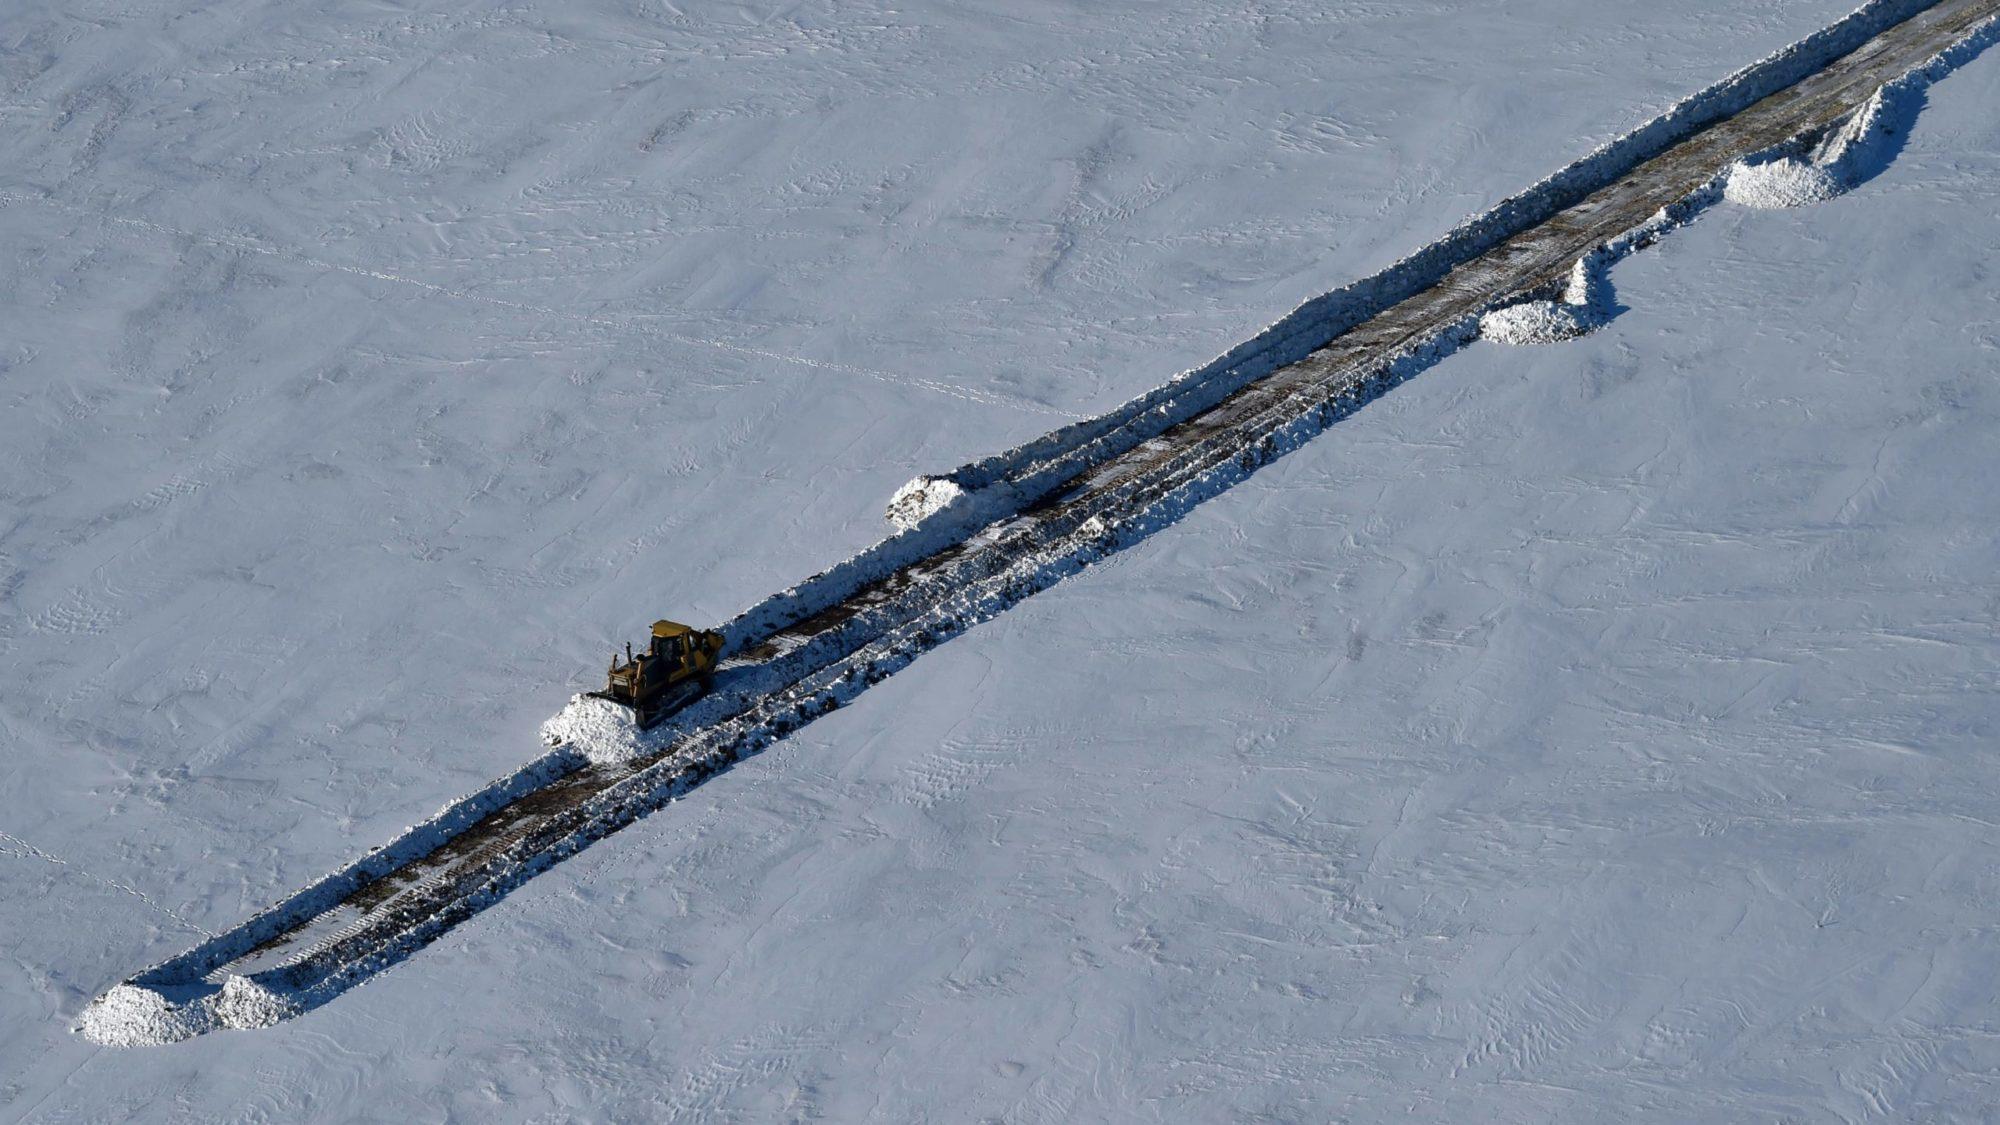 Artic rail